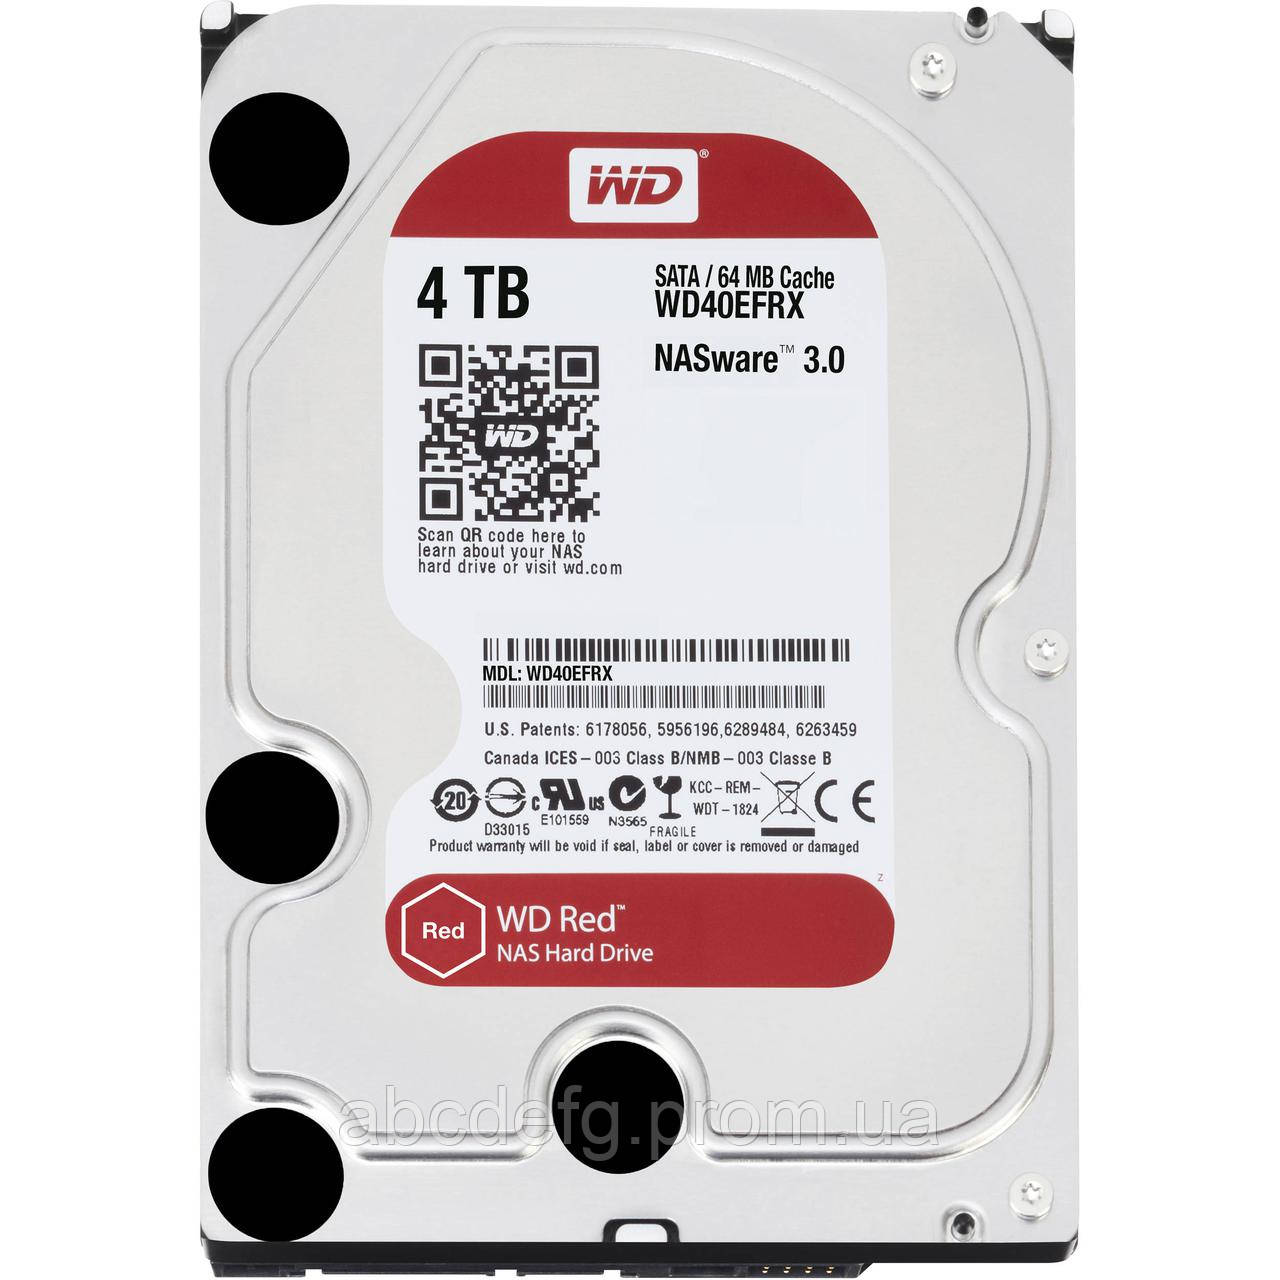 Жесткий диск Western Digital Red 4TB 5400rpm 64MB 3.5 SATA III